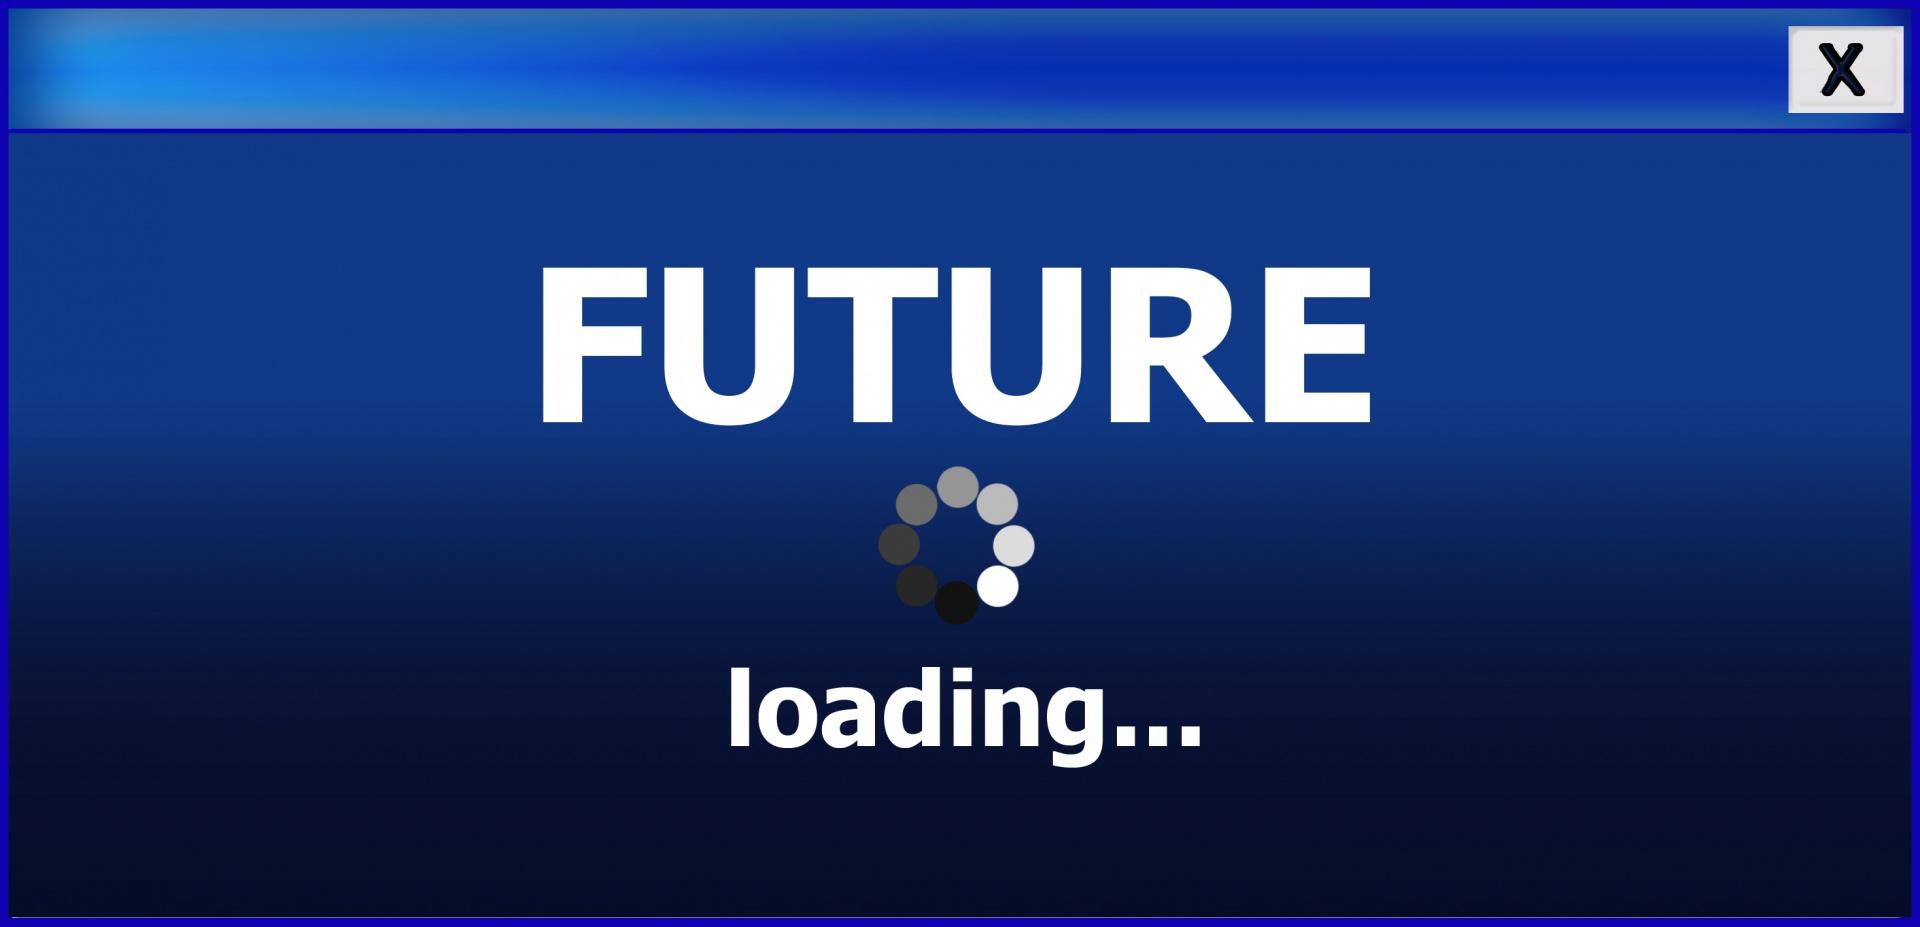 download future - The Online Marketing Progression